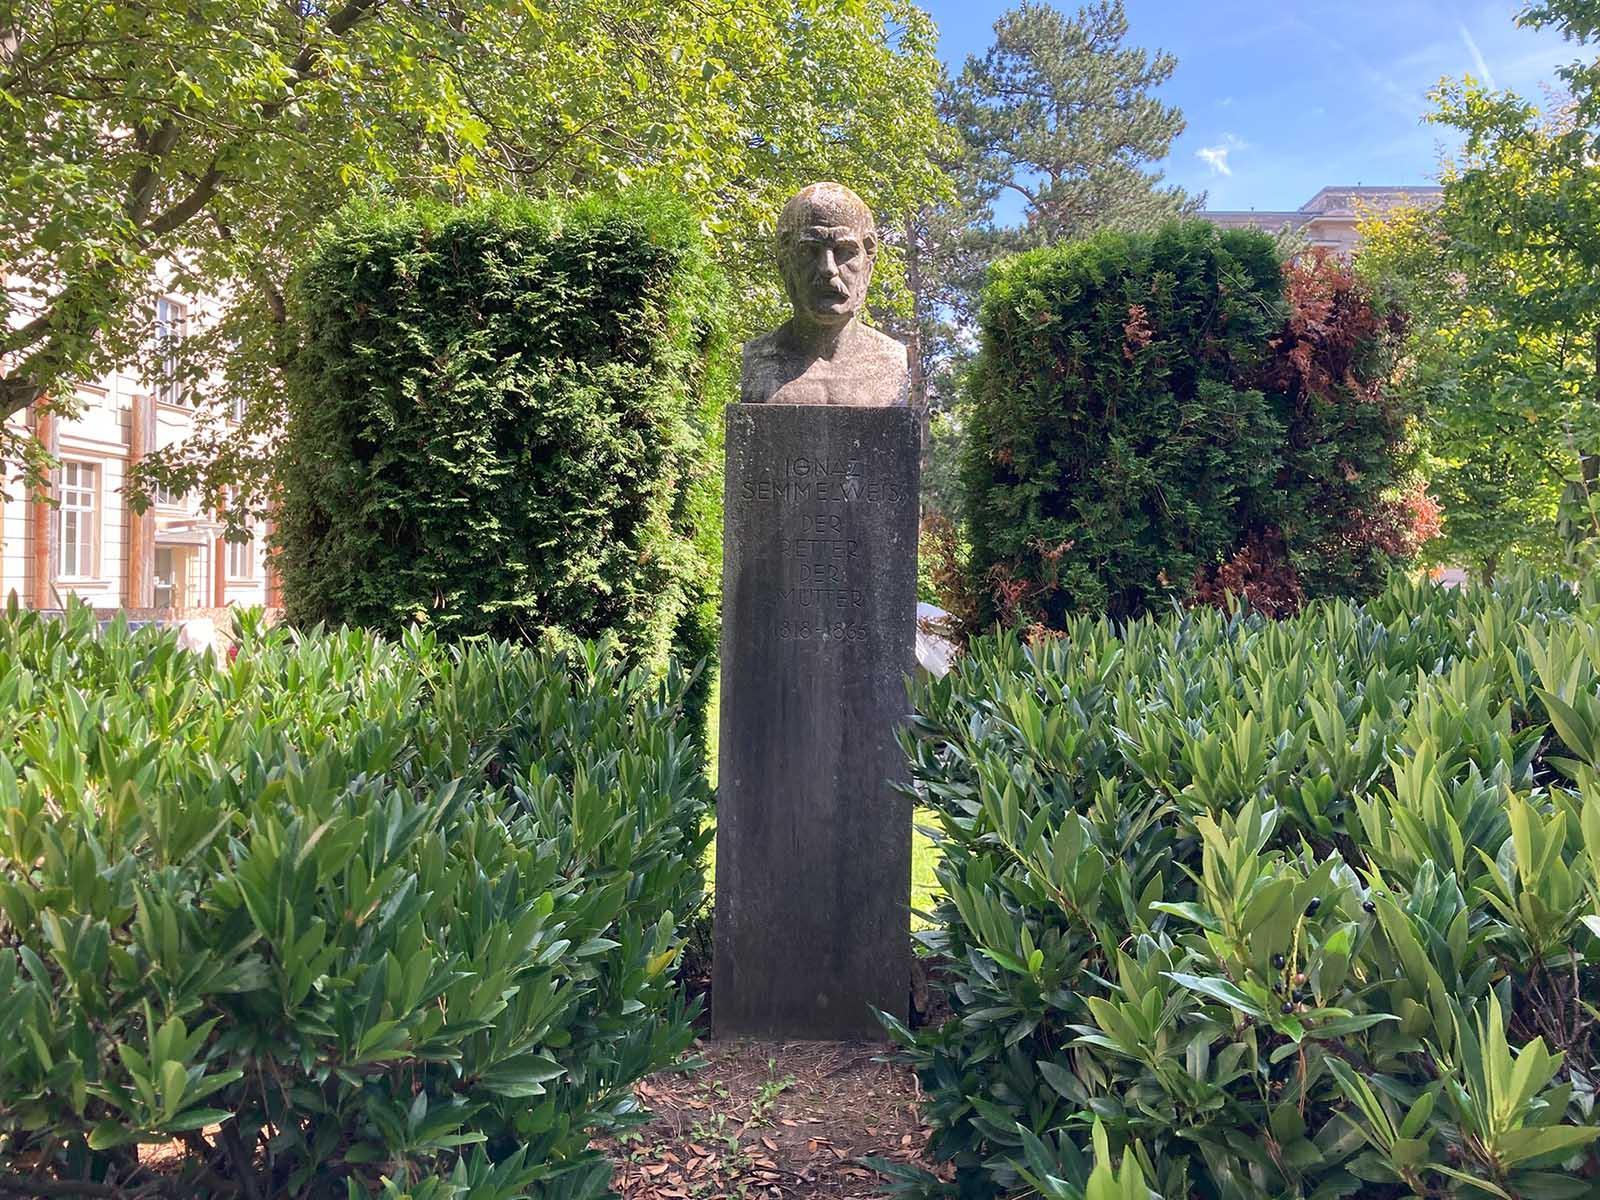 semmelweis, klinik, waehring, vienna